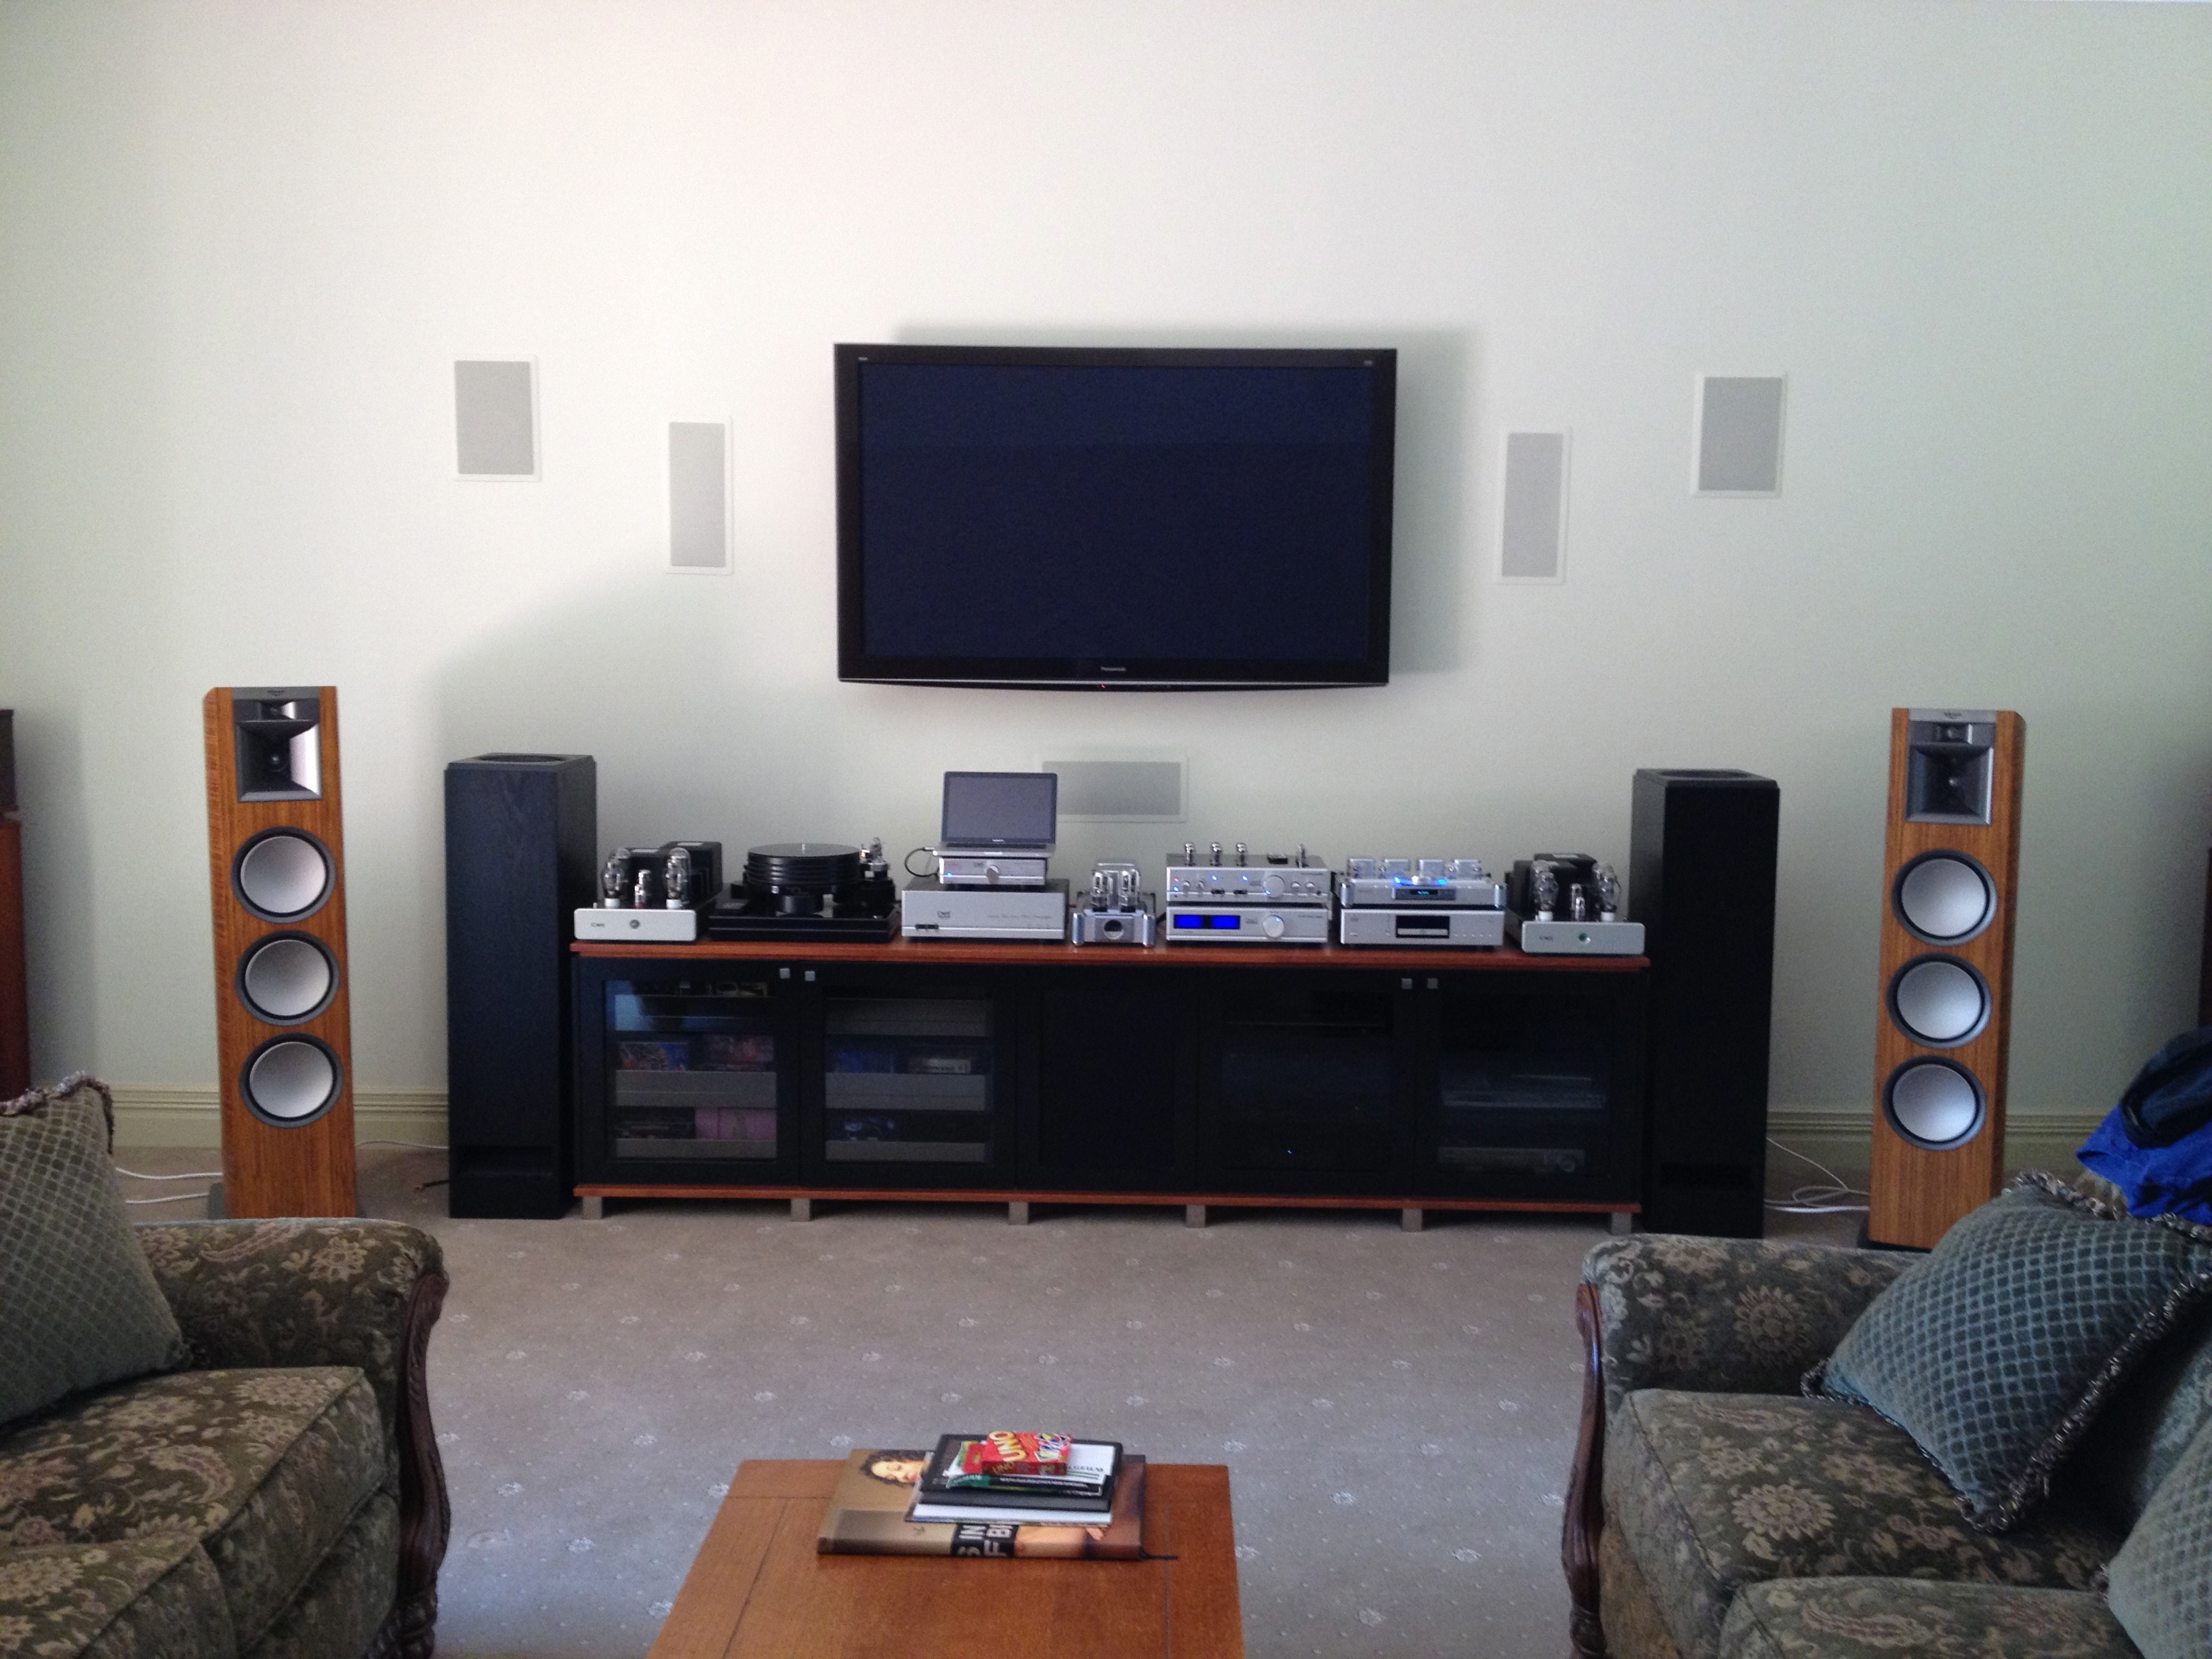 klipsch palladium p 39f speakers nritya creations. Black Bedroom Furniture Sets. Home Design Ideas